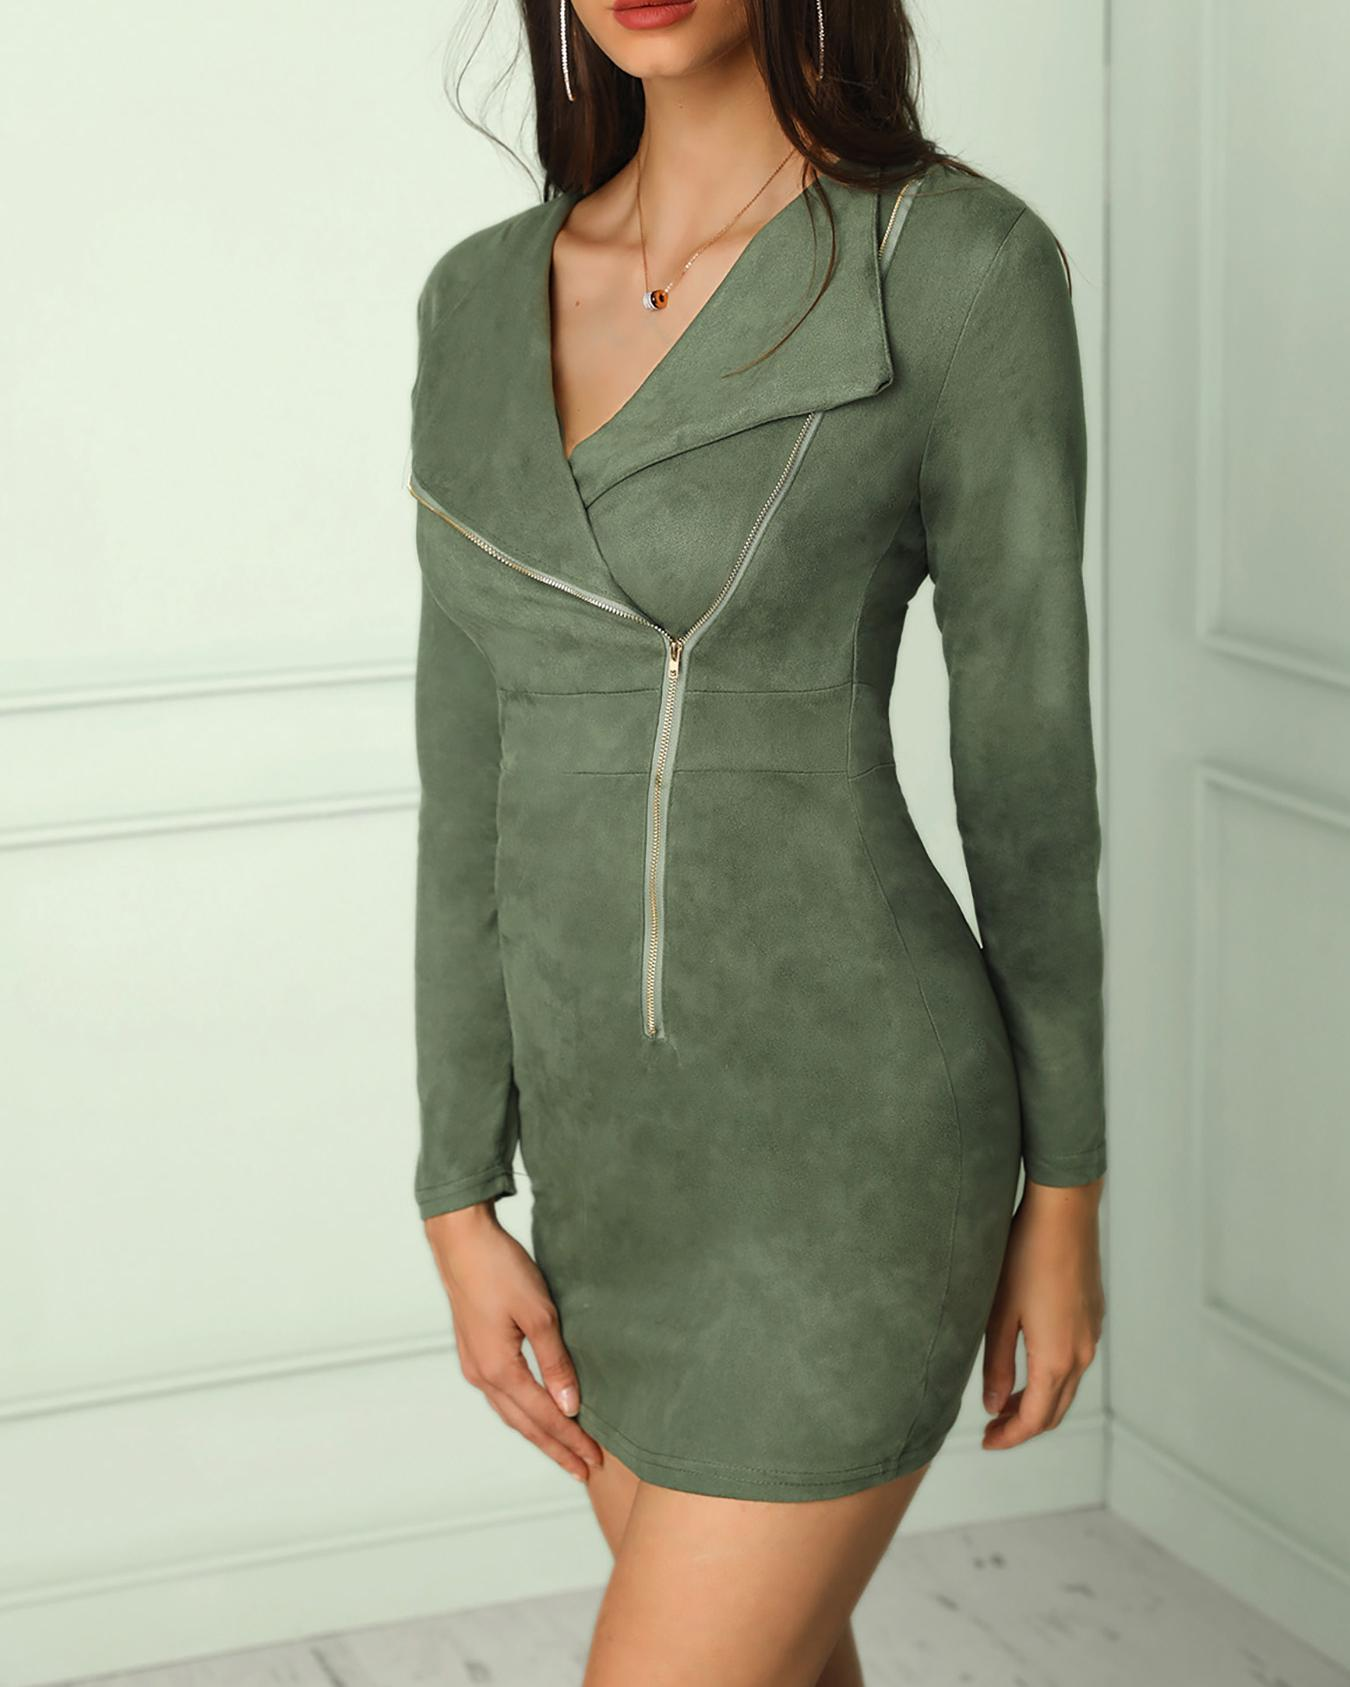 Solid Deep V Side Zipper Slinky Bodycon Dress фото